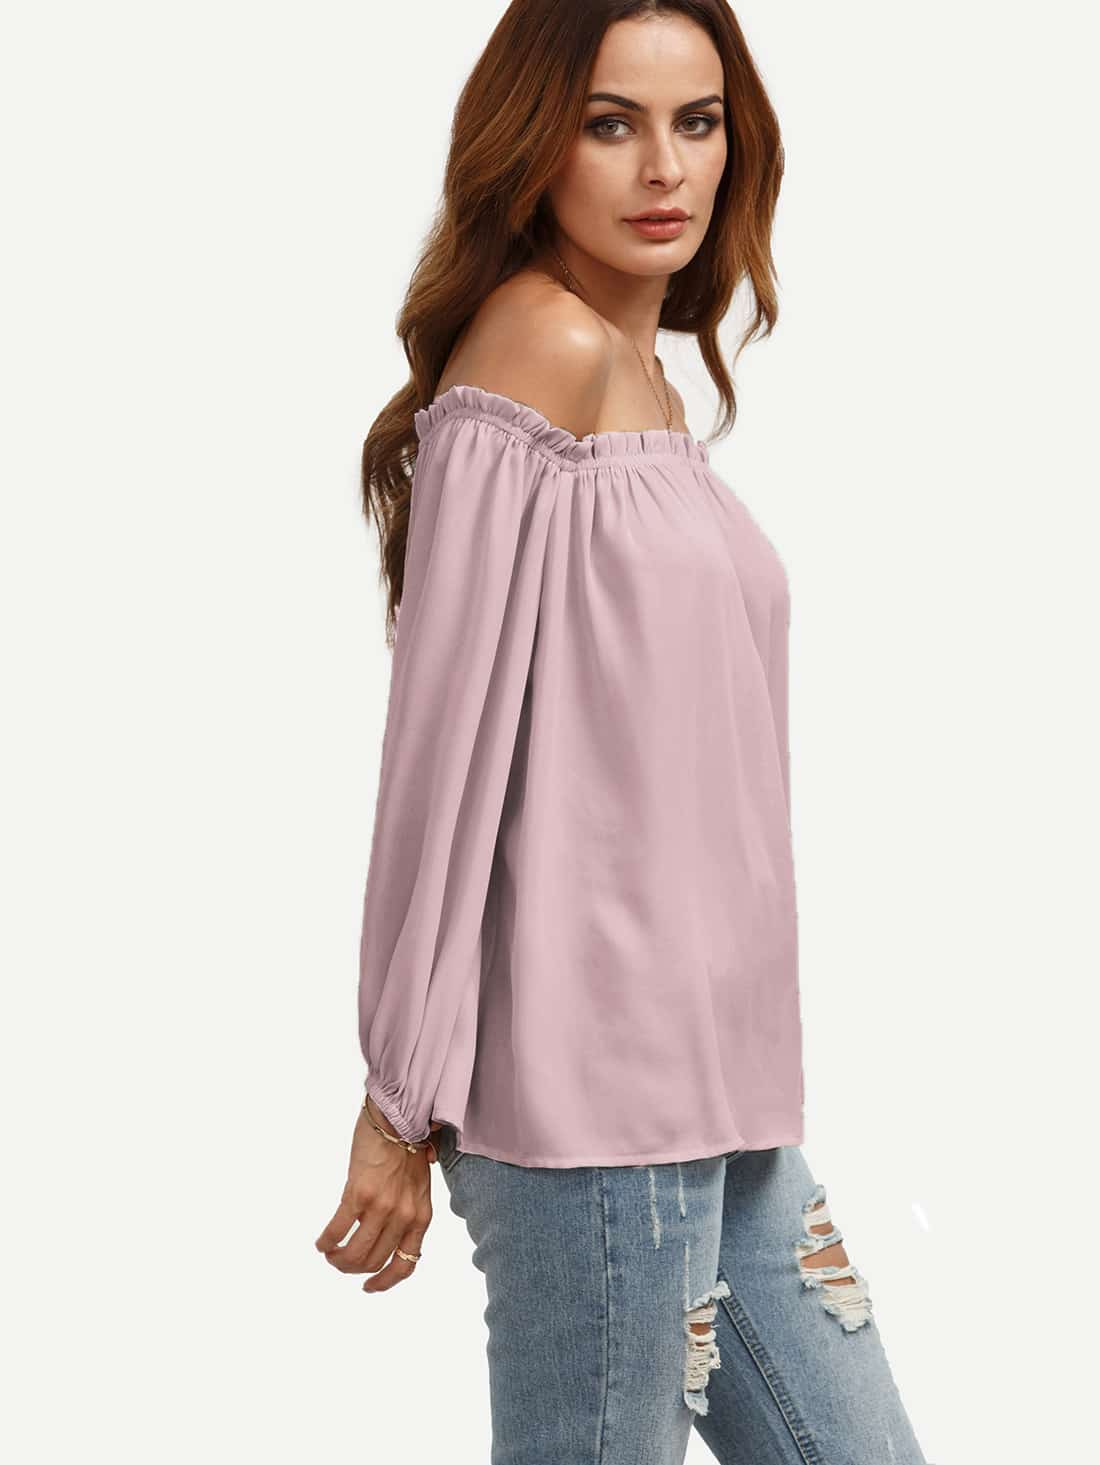 blouse170425702_2